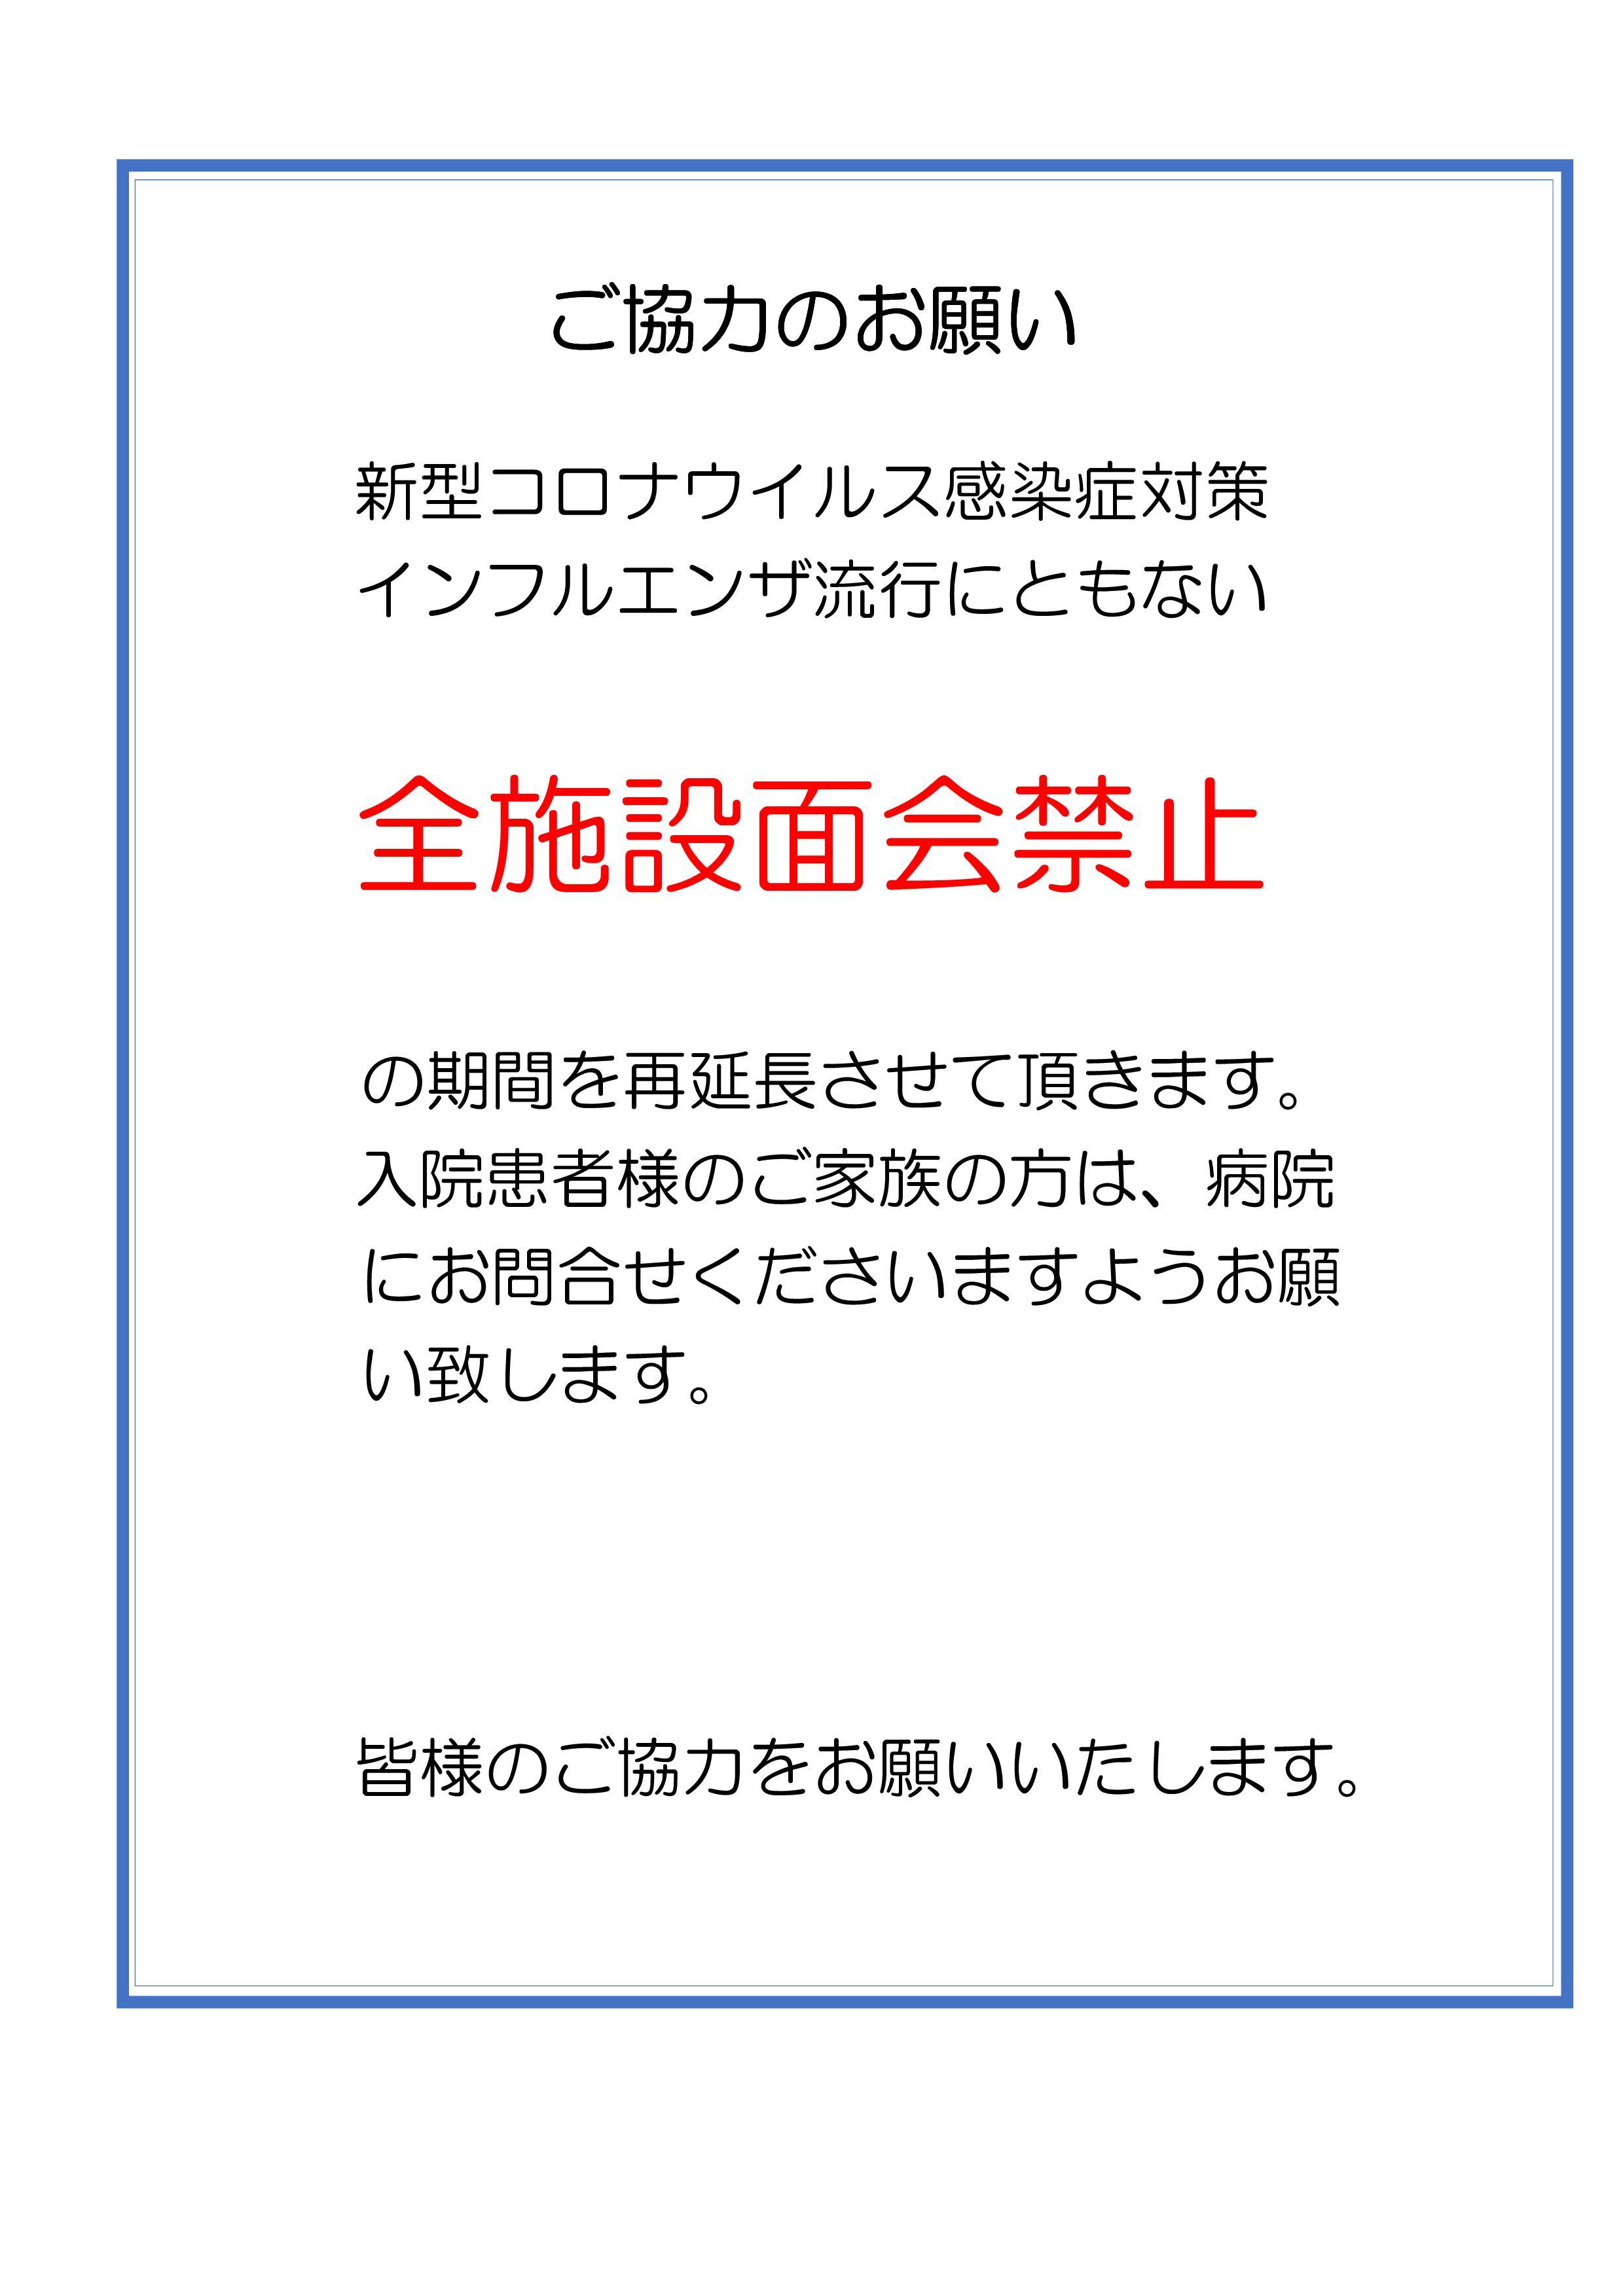 Microsoft Word - ご協力のお願い 延長2.jpg